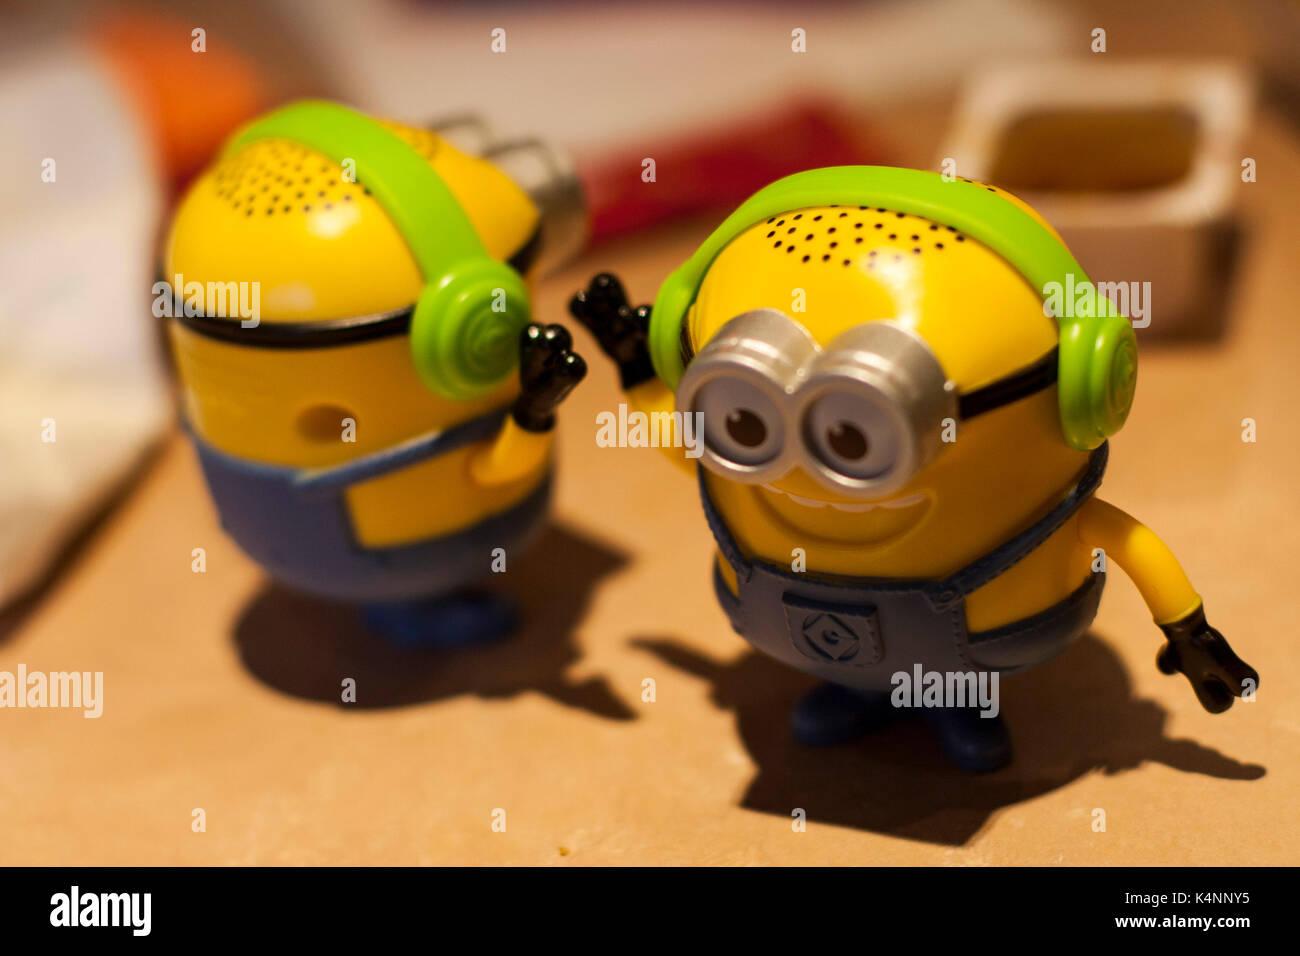 Happy meal mcdonalds toy stockfotos